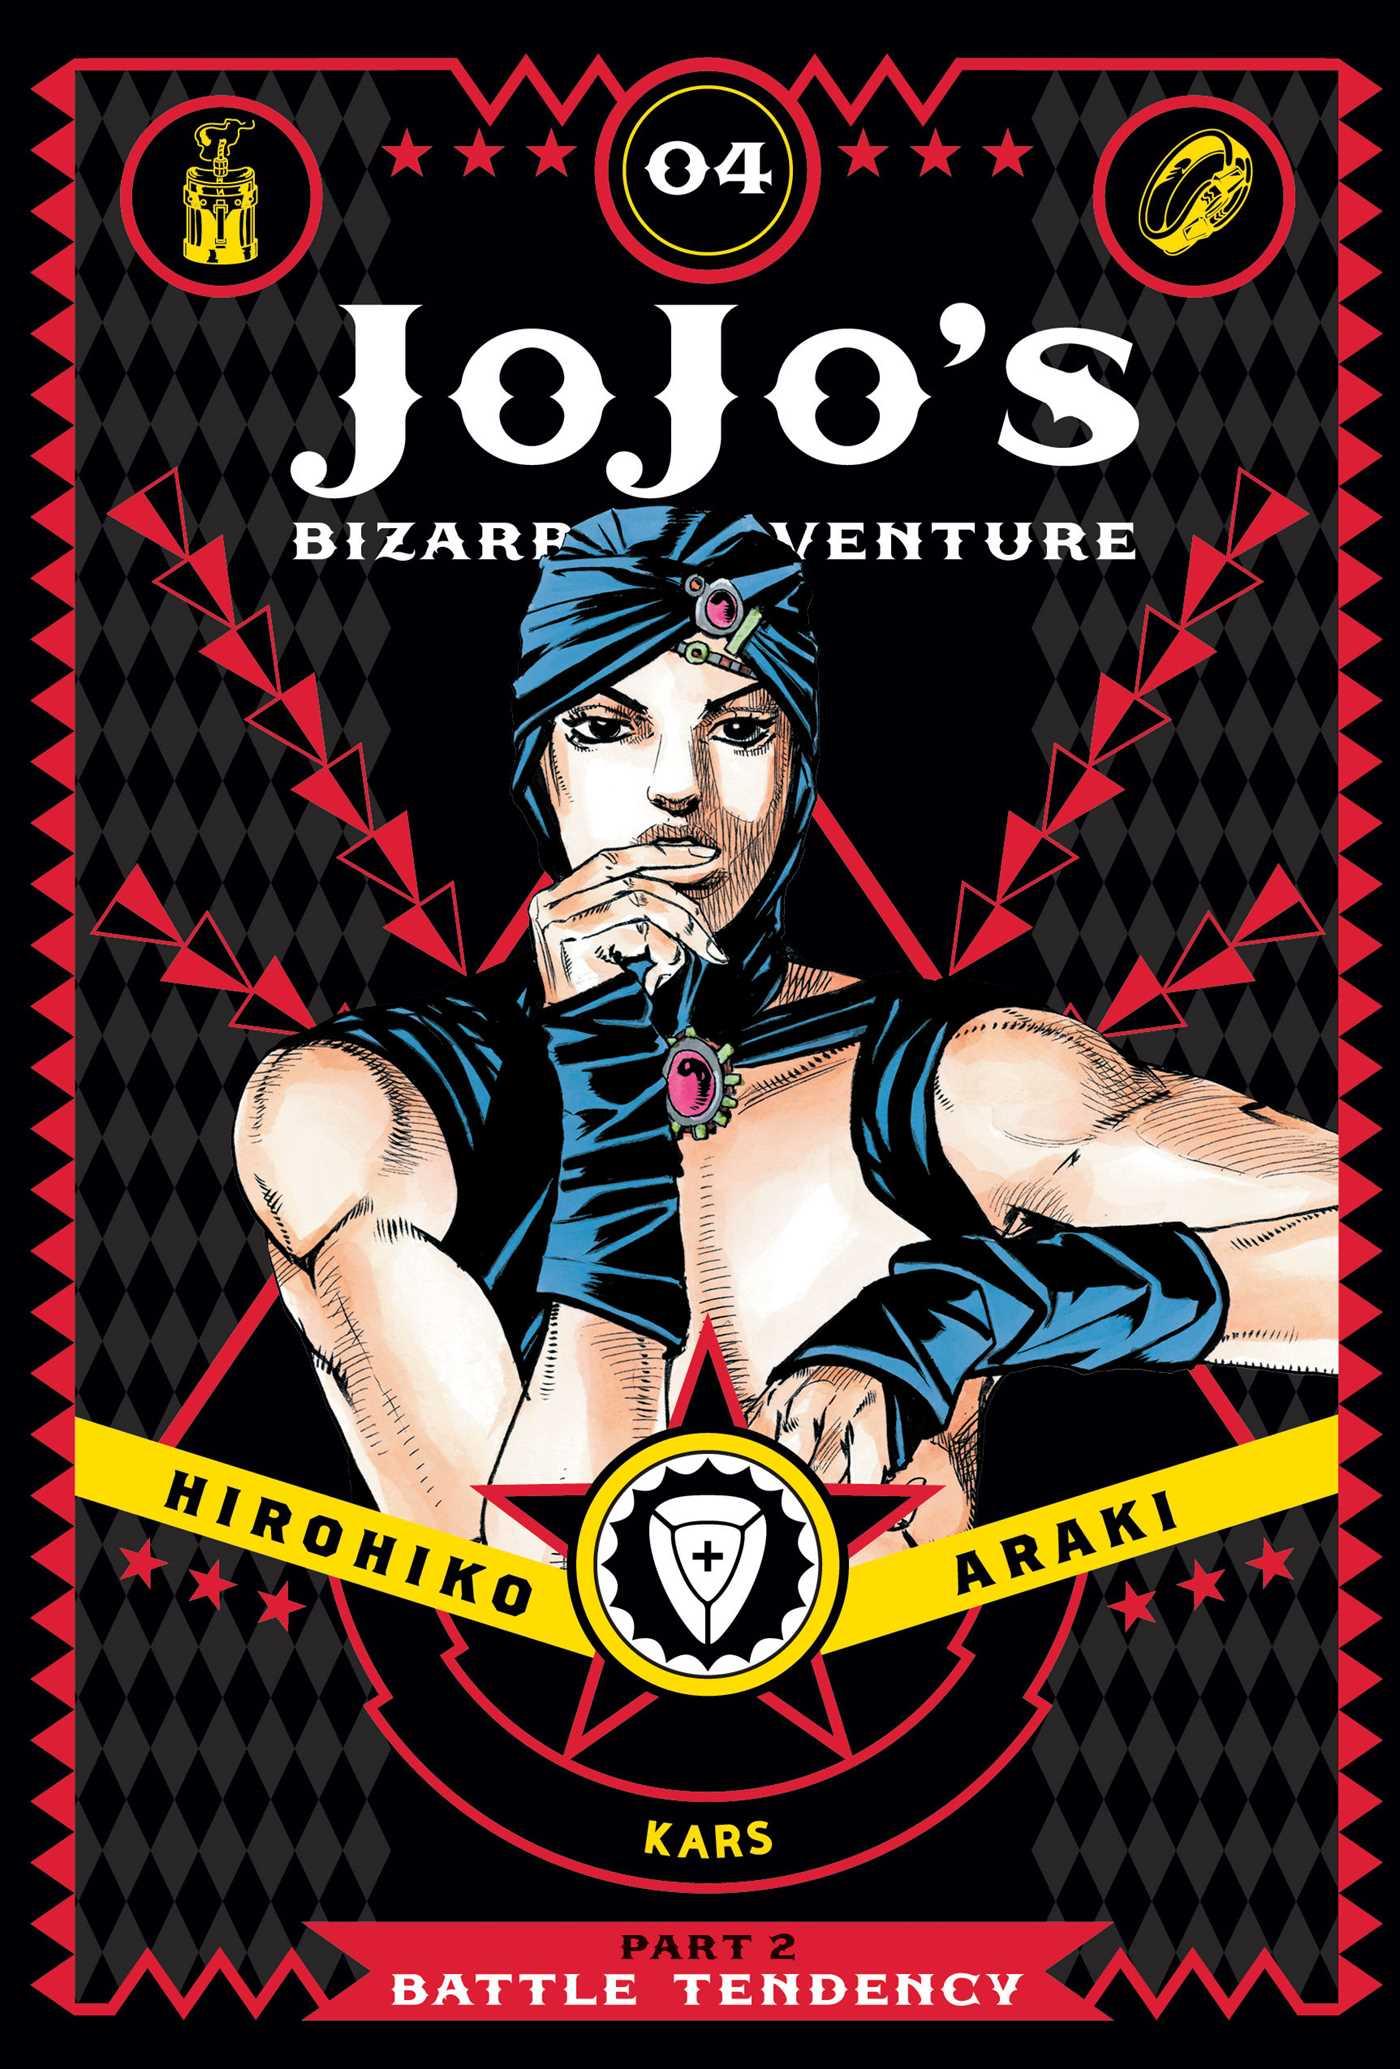 JoJo's Bizarre Adventure Part 2 Battle Tendency Manga Volume 4 (Hardcover)